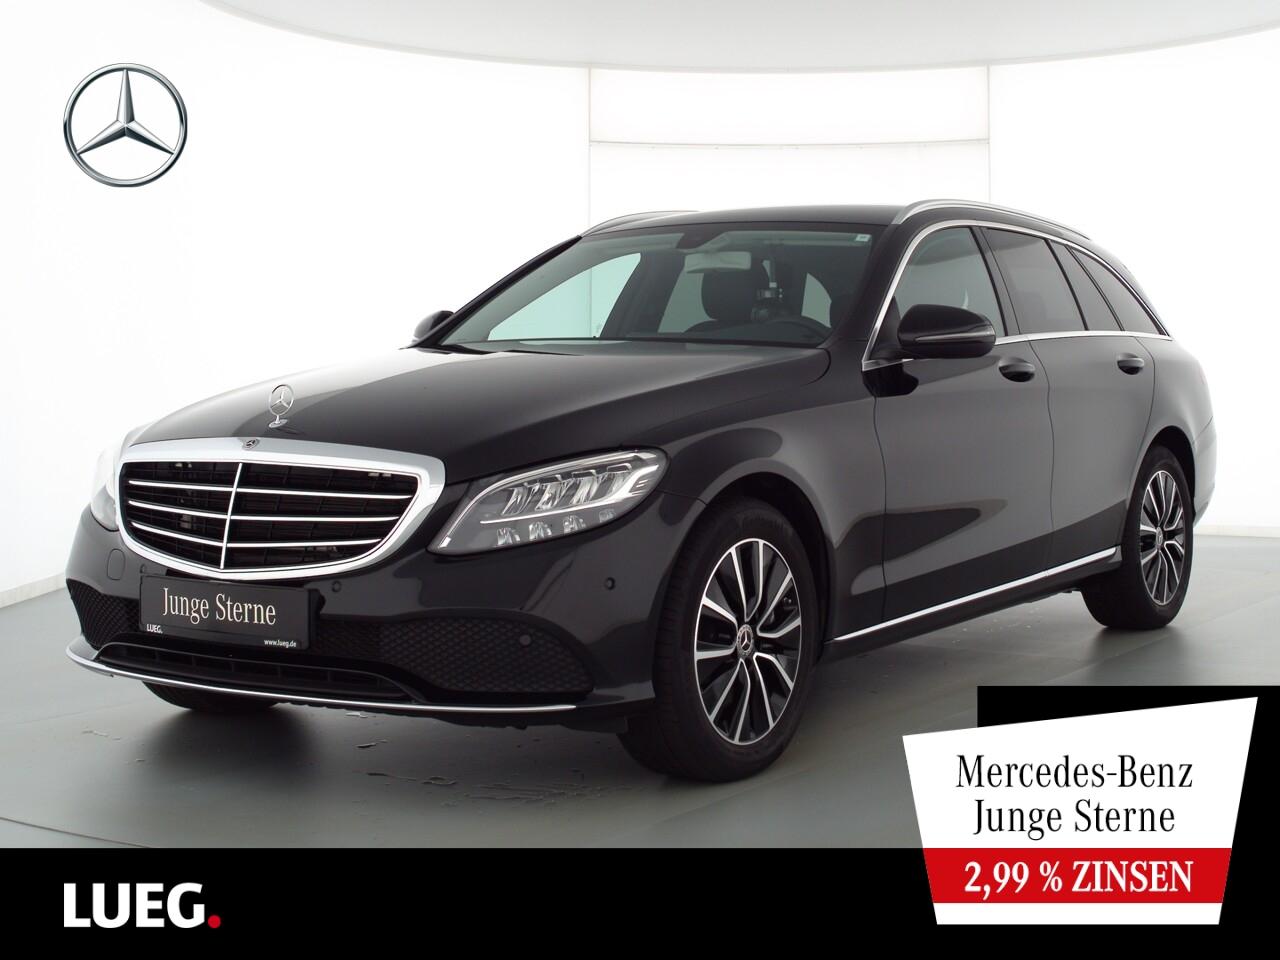 Mercedes-Benz C 300 T Exclusive+Navi+LED-HP+EHeck+CarPl+Kamera, Jahr 2020, Benzin